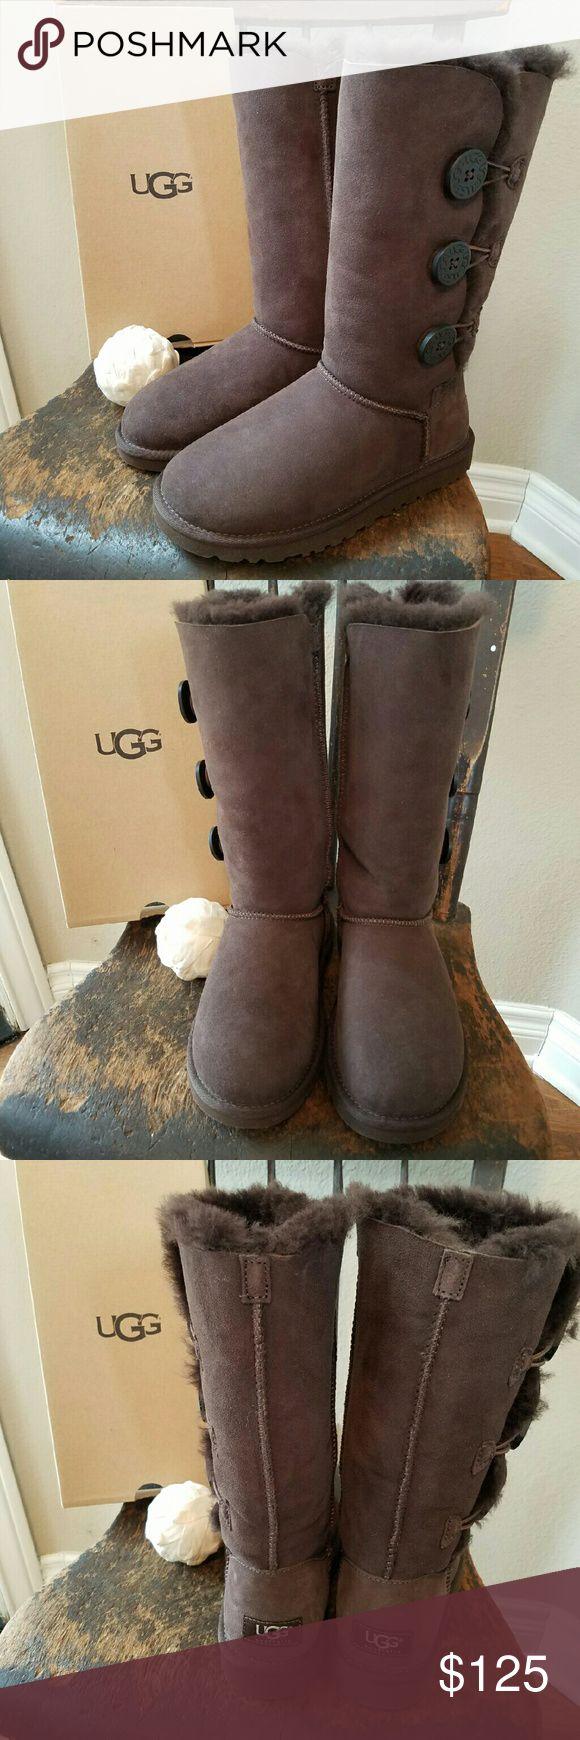 1000 Ideas About Mens Rain amp Winter Boots On Pinterest